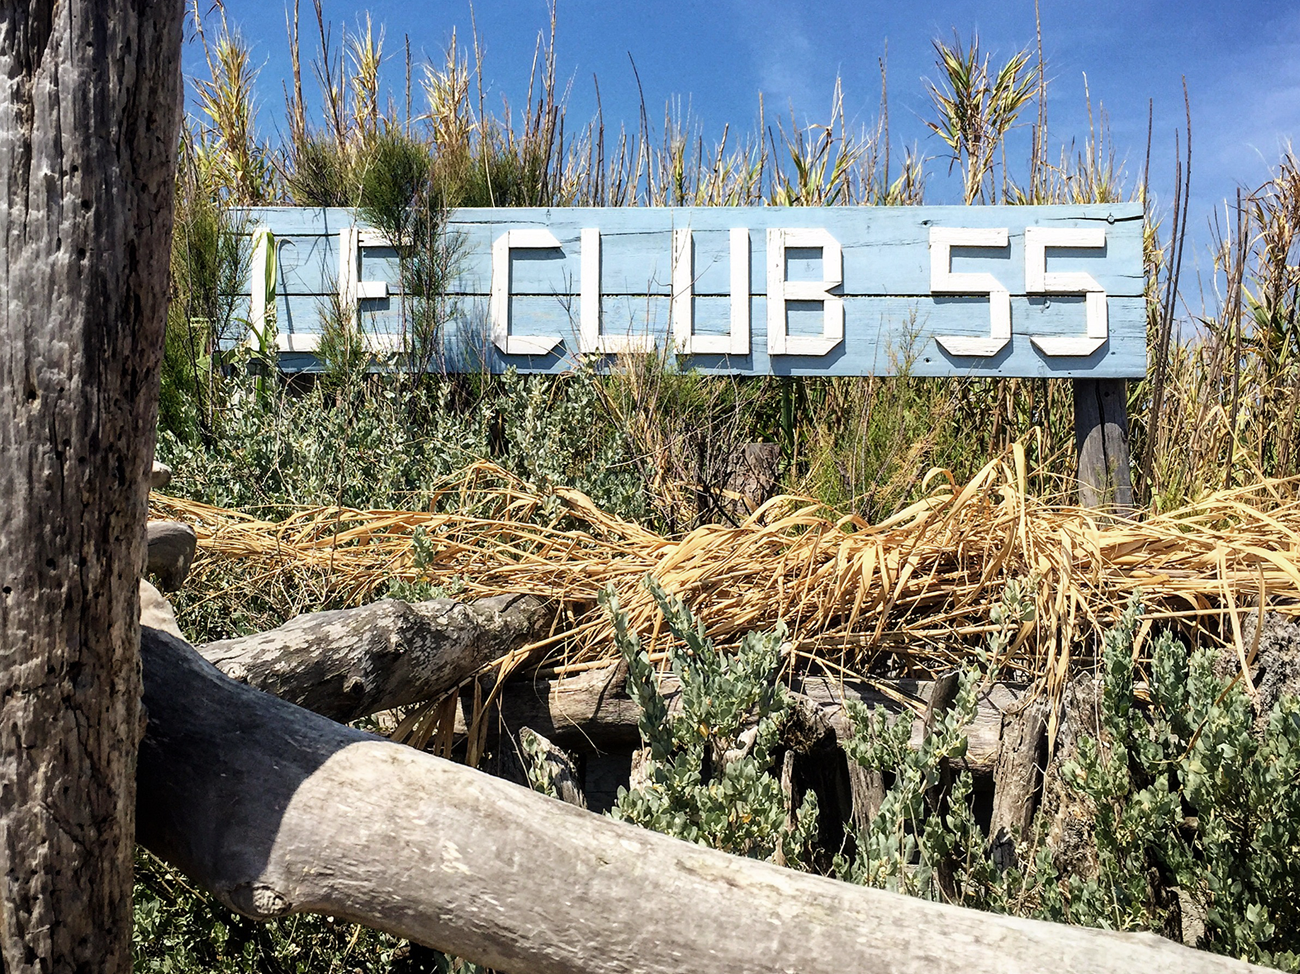 Piscine at Club 55 Saint Tropez